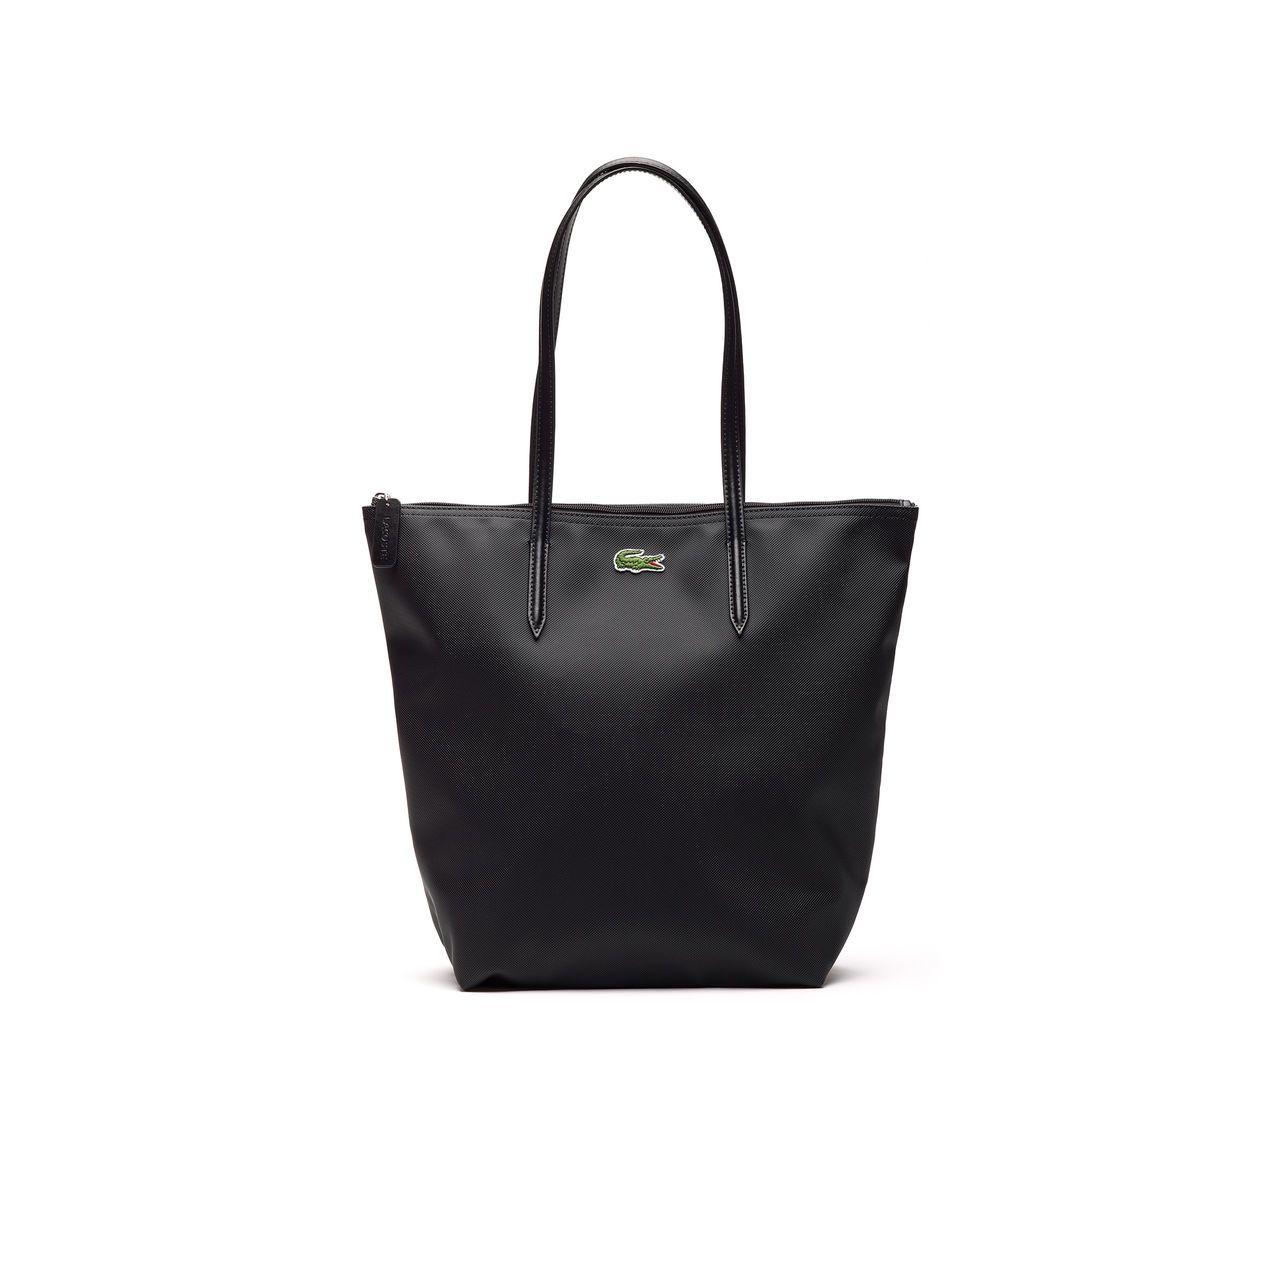 Sac Cabas Zippe Vertical L 12 12 Concept Sac Cabas Sac Tote Bag